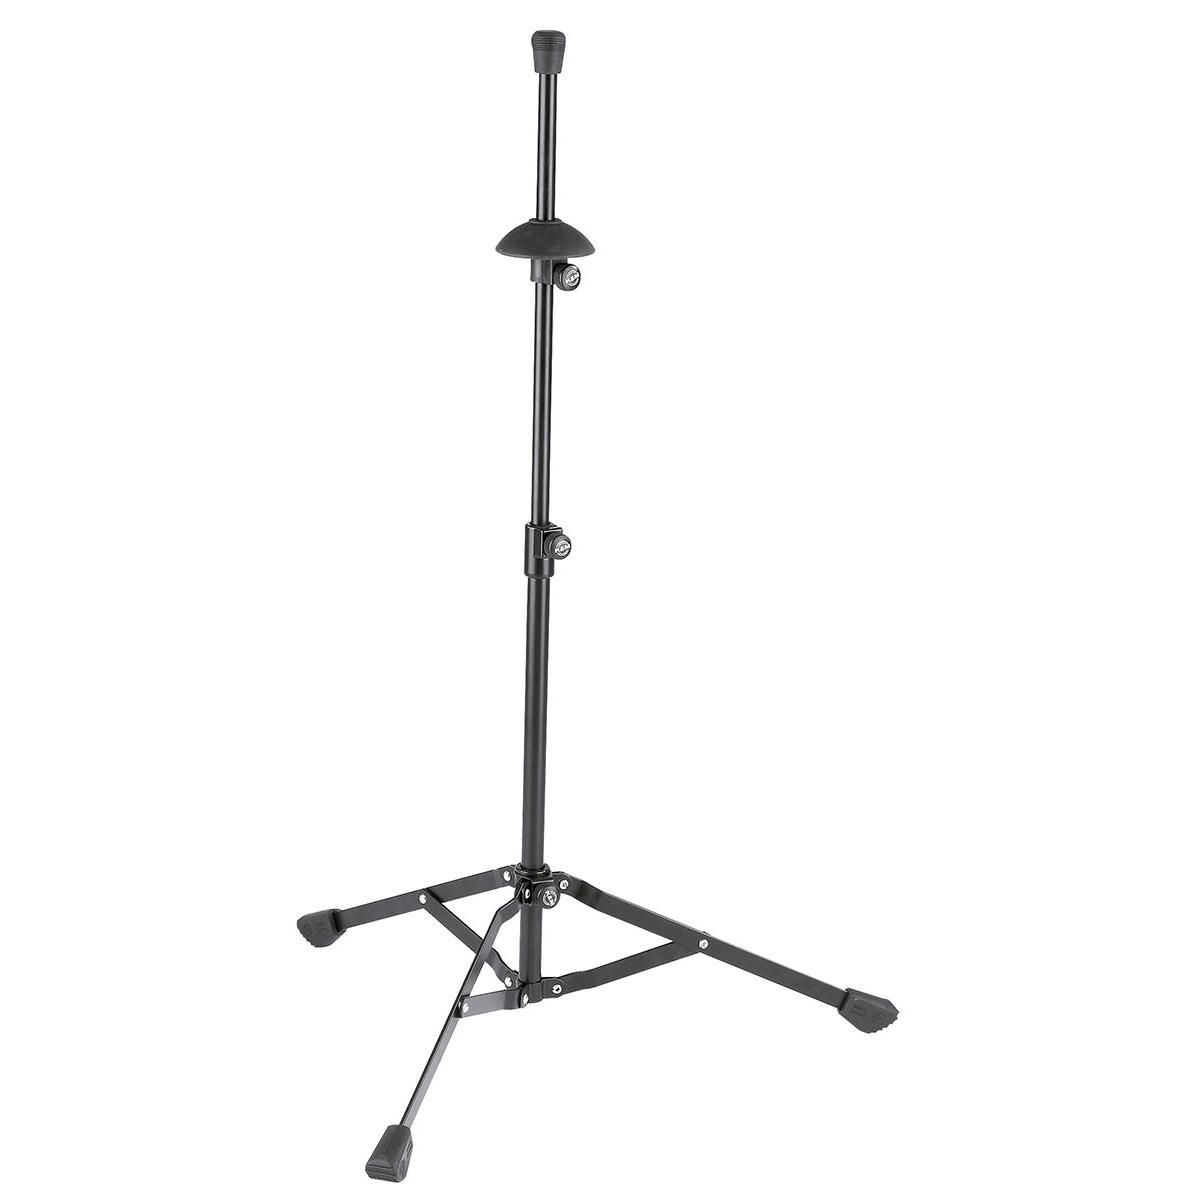 Konig & Meyer Deluxe. KM14990  Trombone Stand